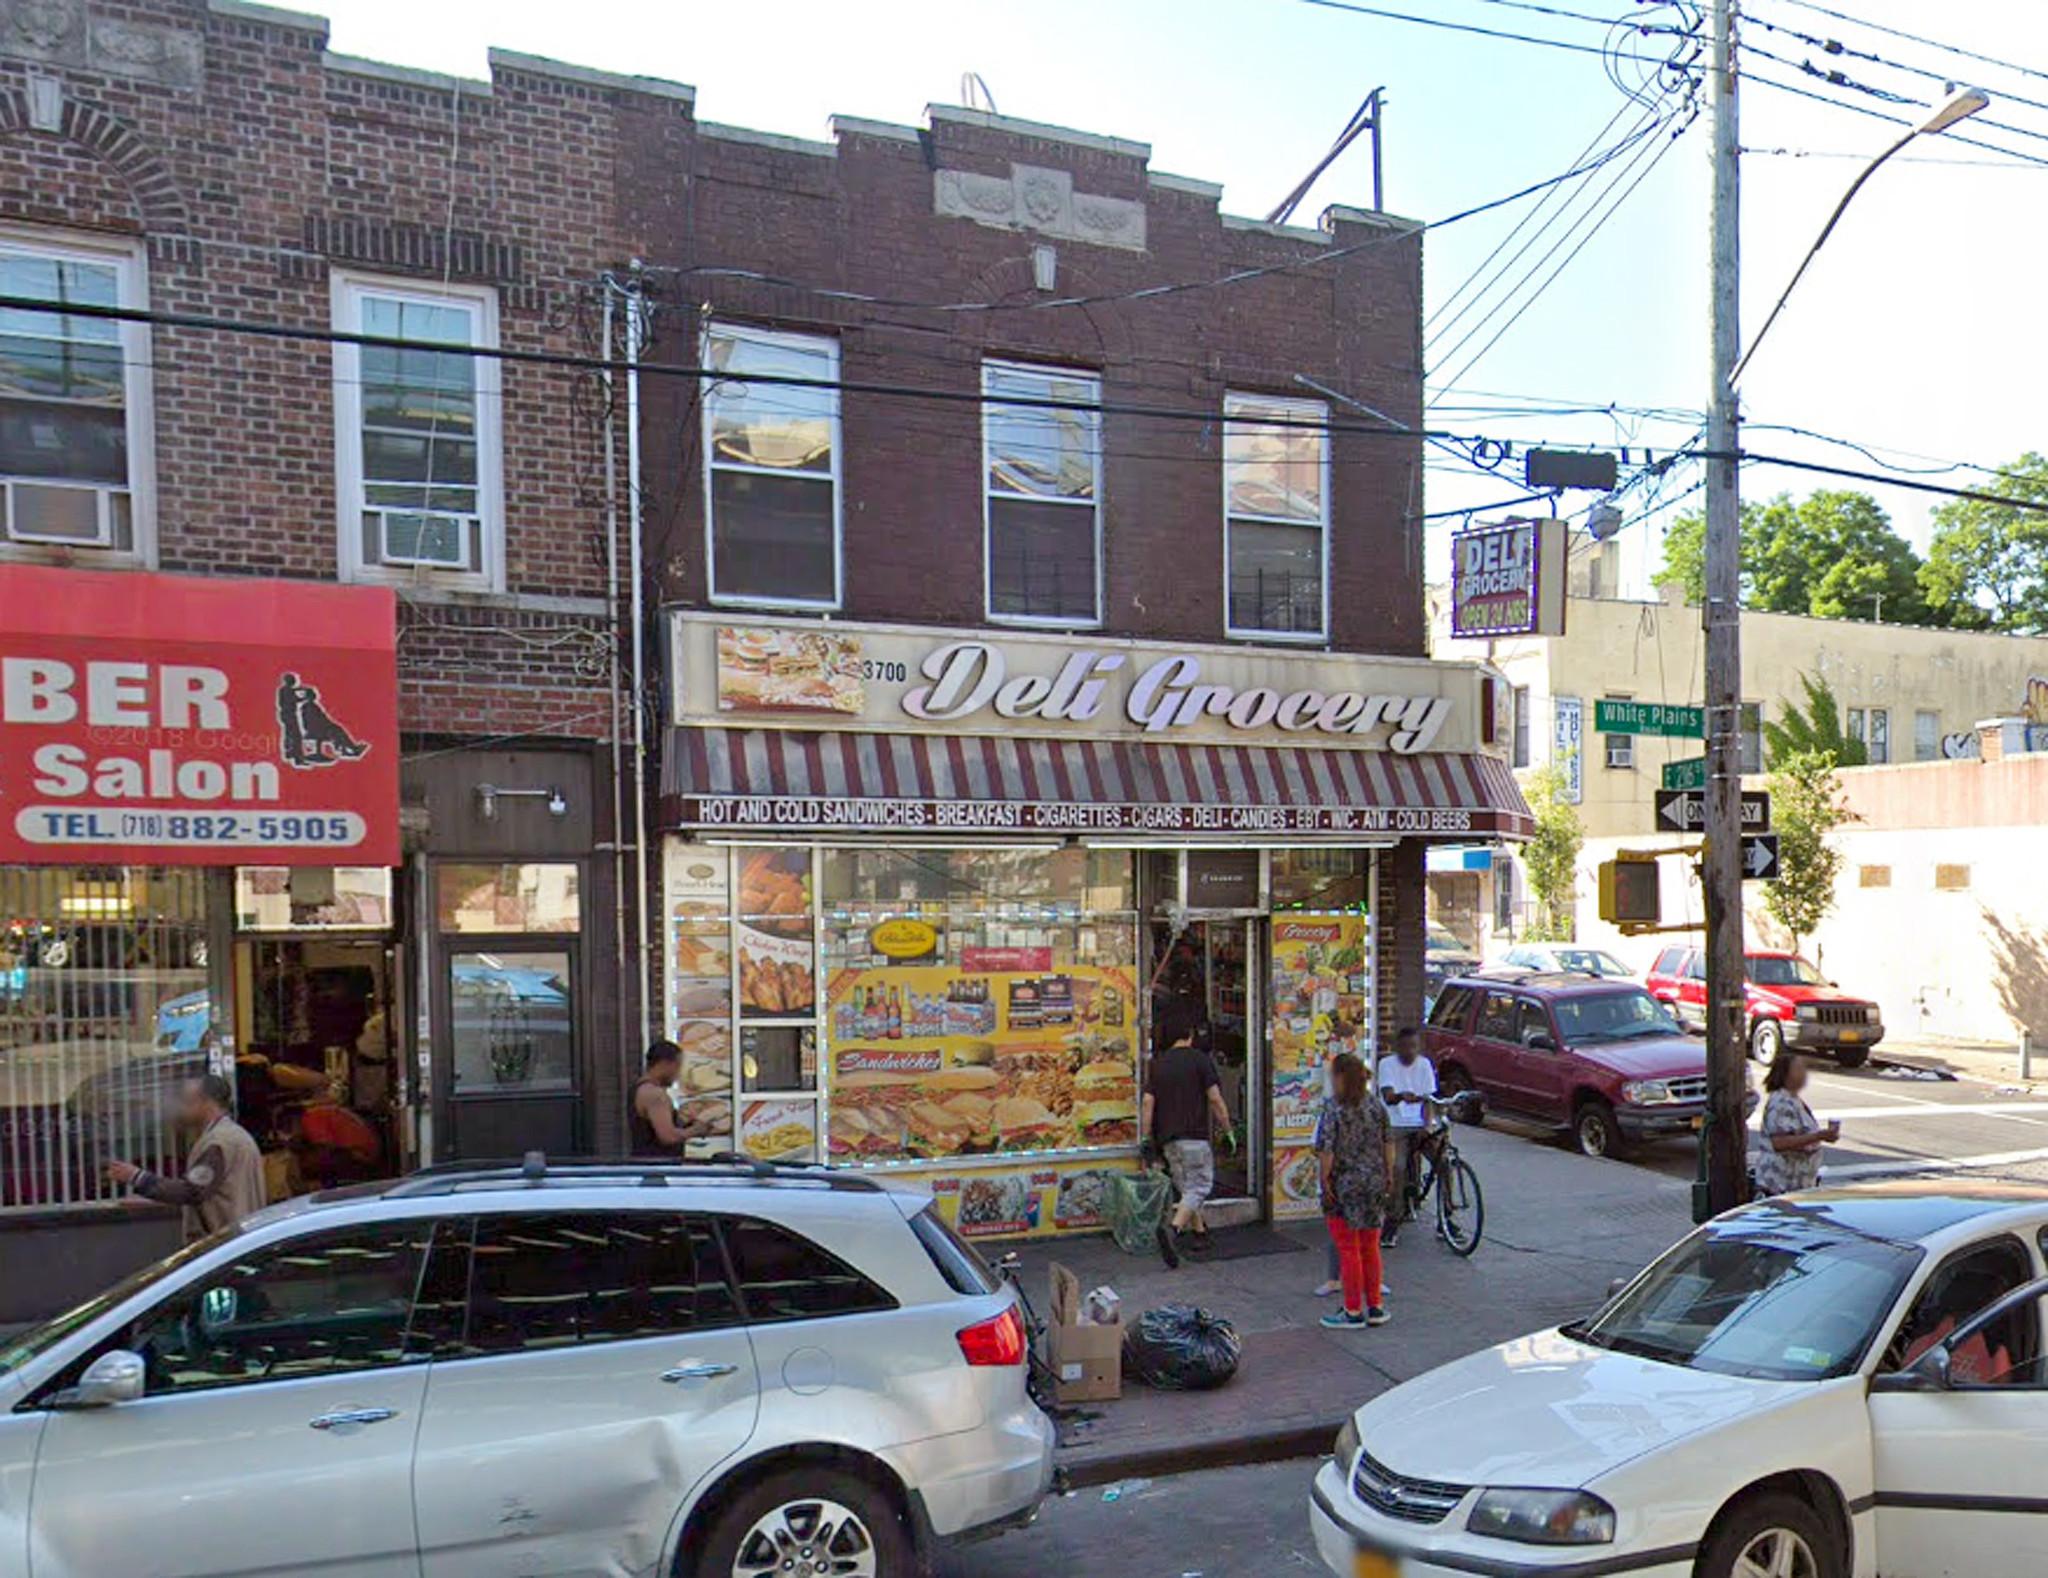 Worker shot dead behind counter of Bronx deli